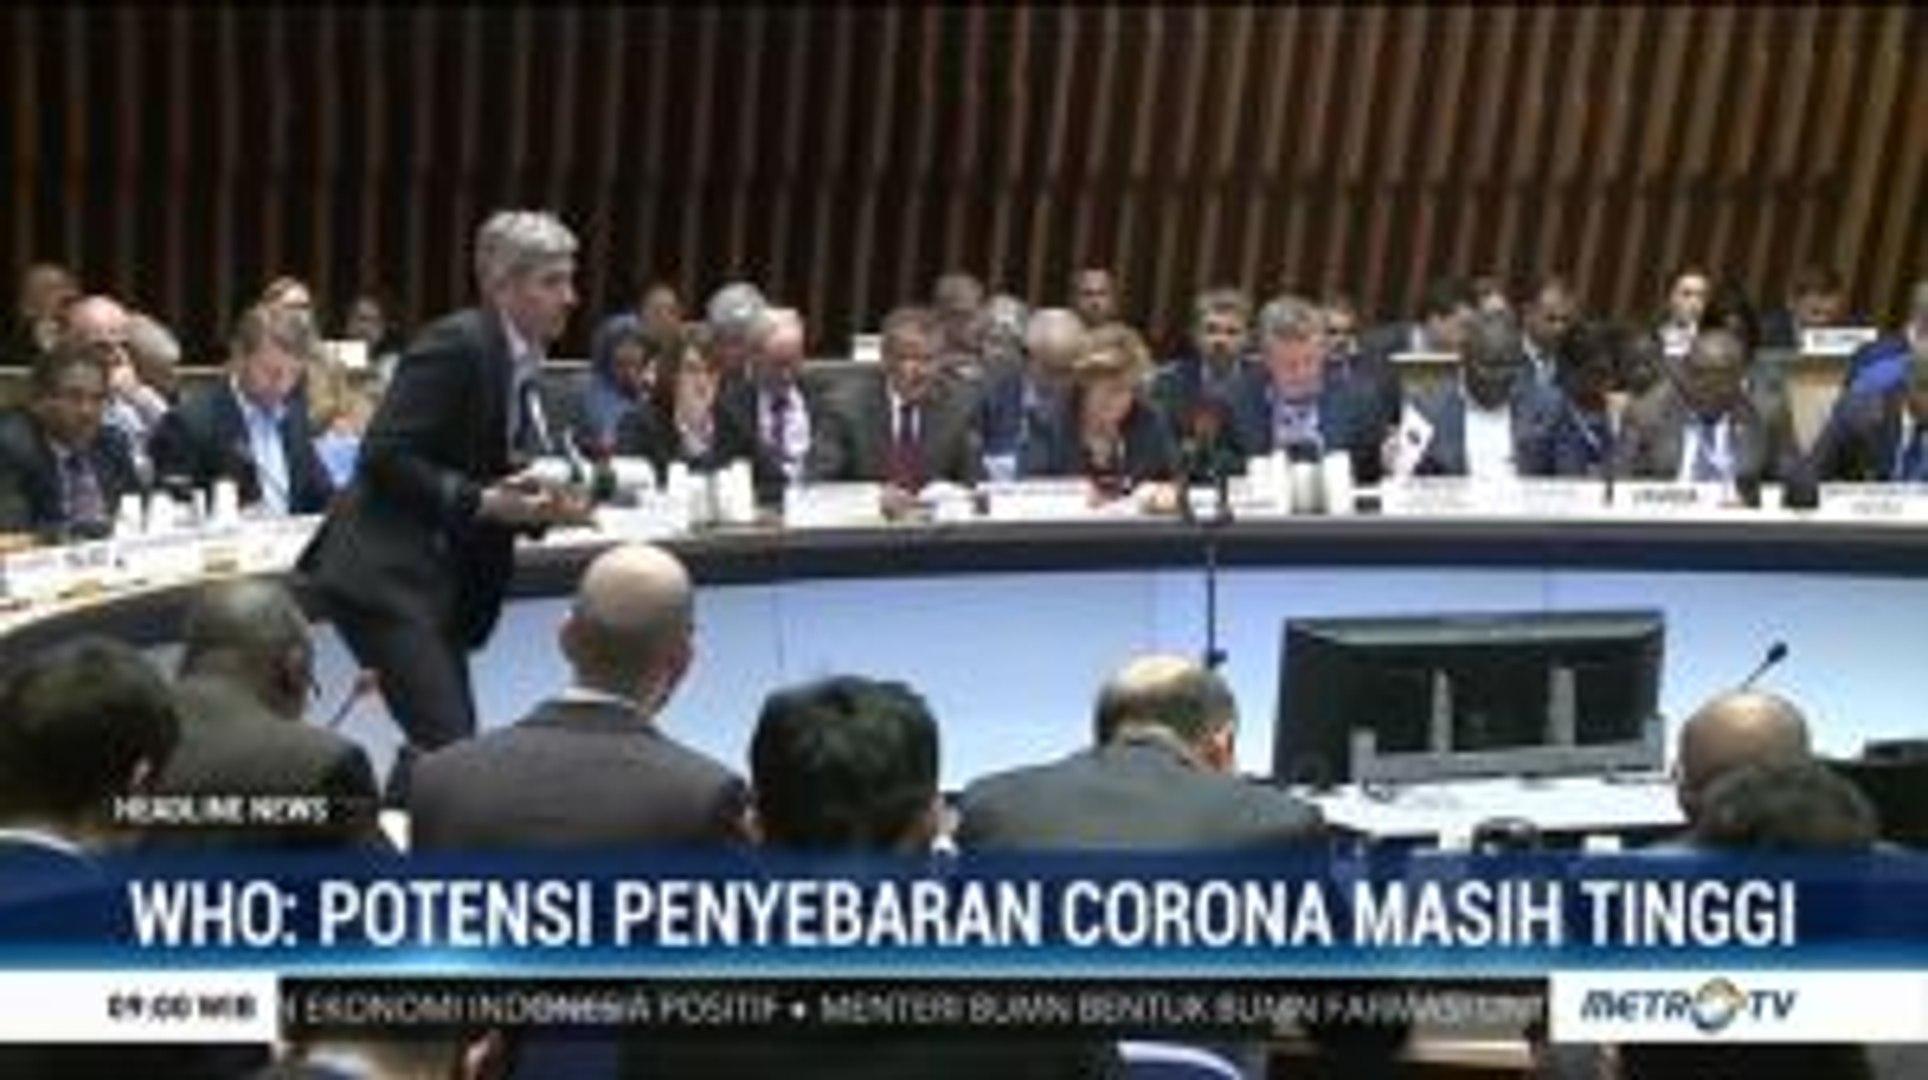 WHO: Potensi Penyebaran Virus Corona Masih Tinggi